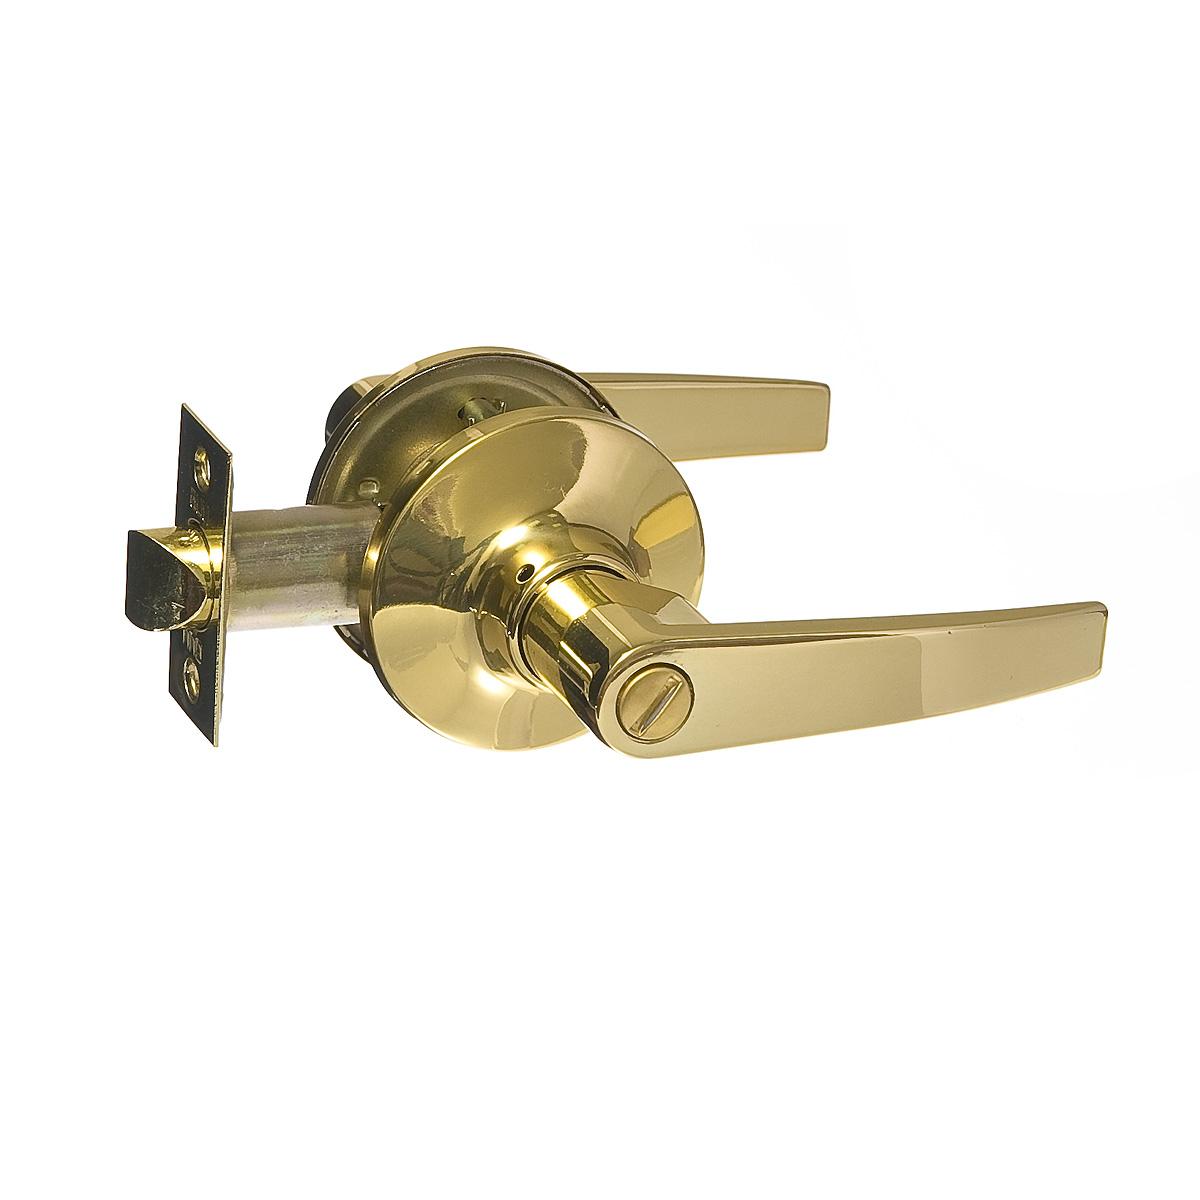 Ручка-защелка дверная Guli 808 ВР ВК (золото) с заверткой